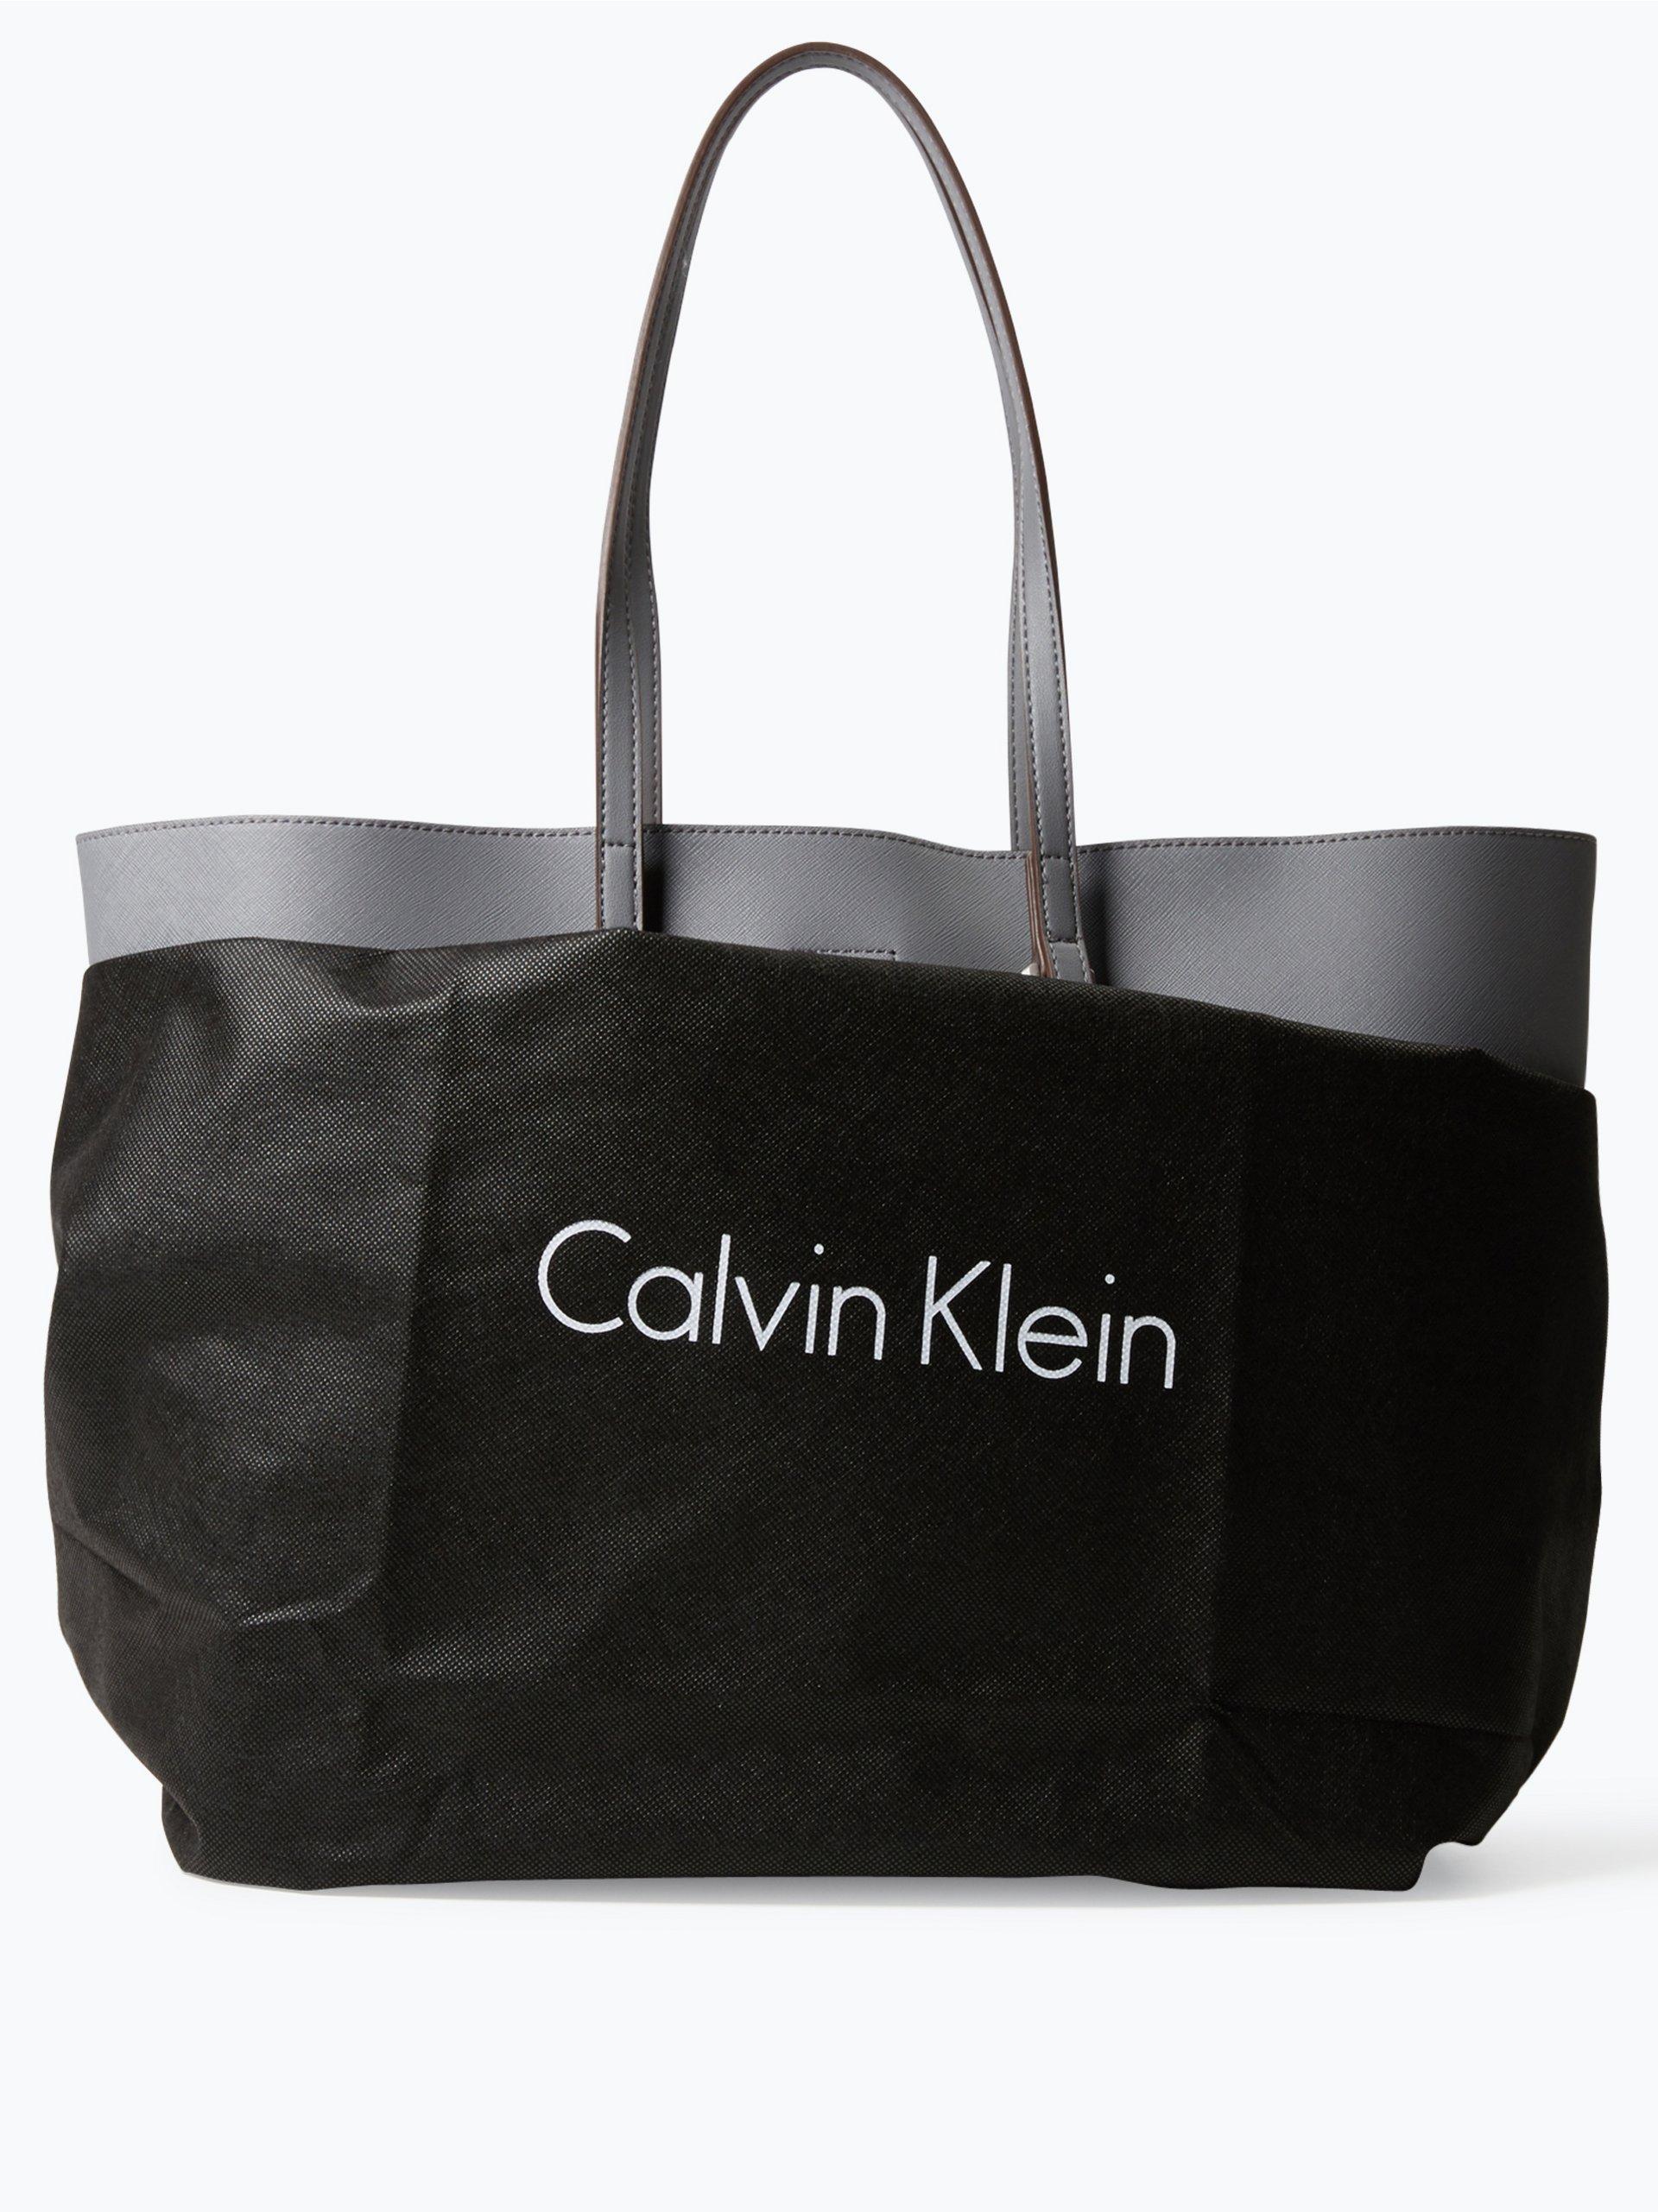 calvin klein damen shopper solid grau uni online kaufen. Black Bedroom Furniture Sets. Home Design Ideas